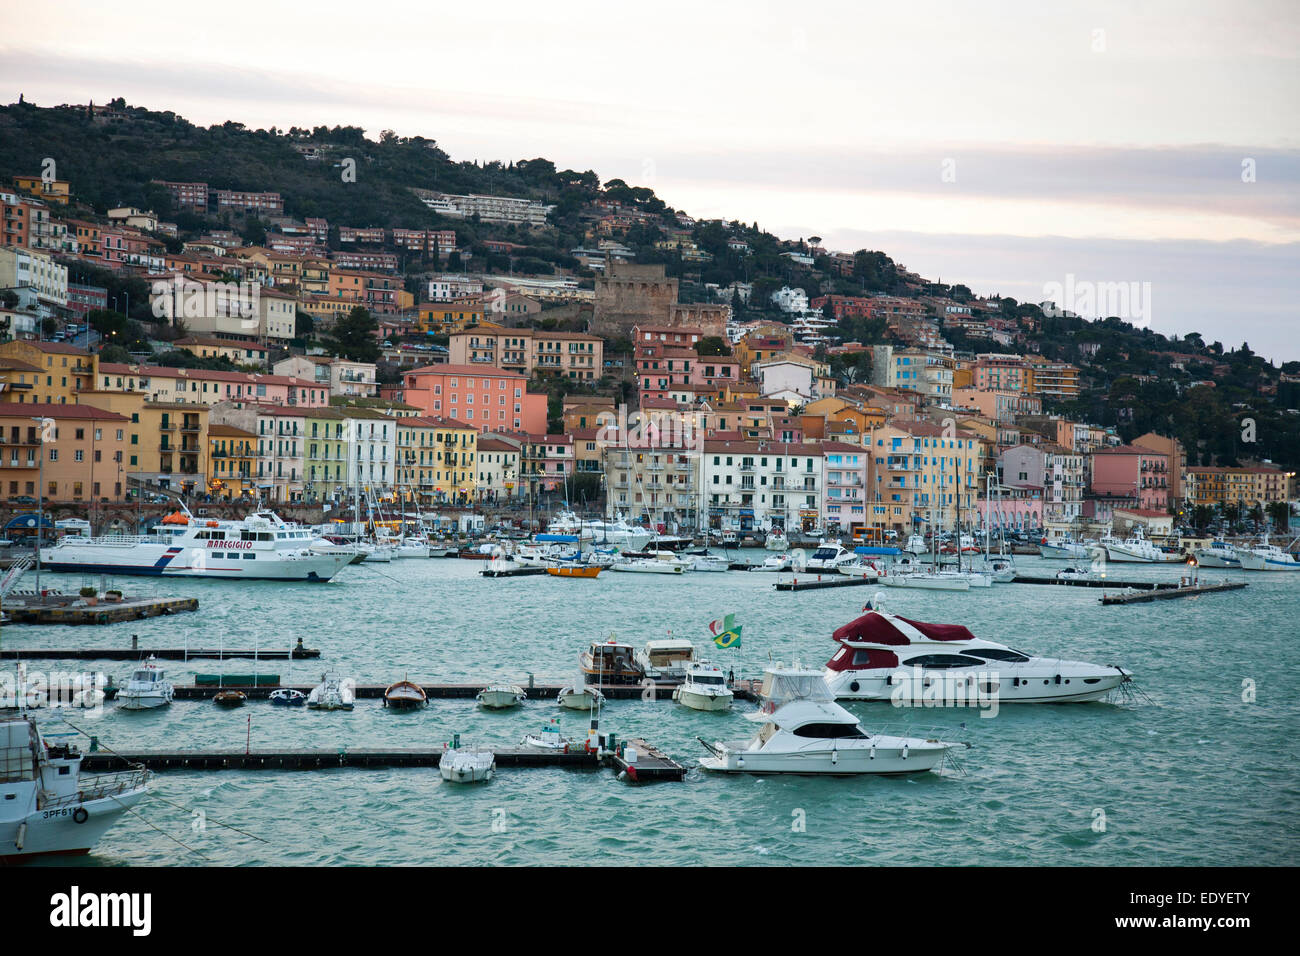 porto santo stefano, argentario, tuscany, italy, europe - Stock Image